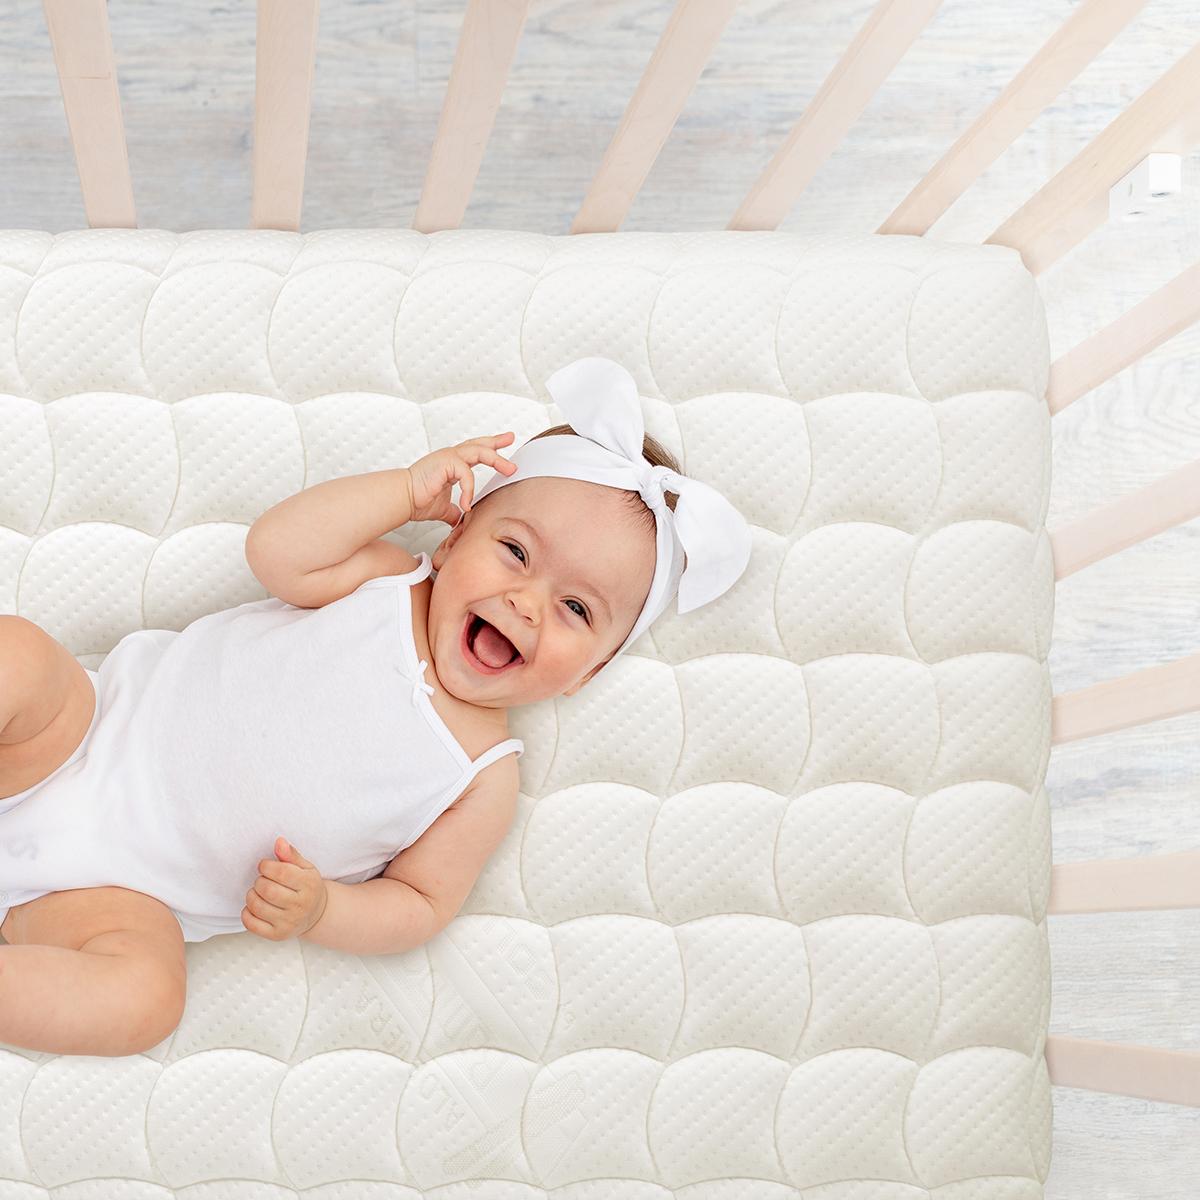 baby Baby colunex baby mattress 02 1